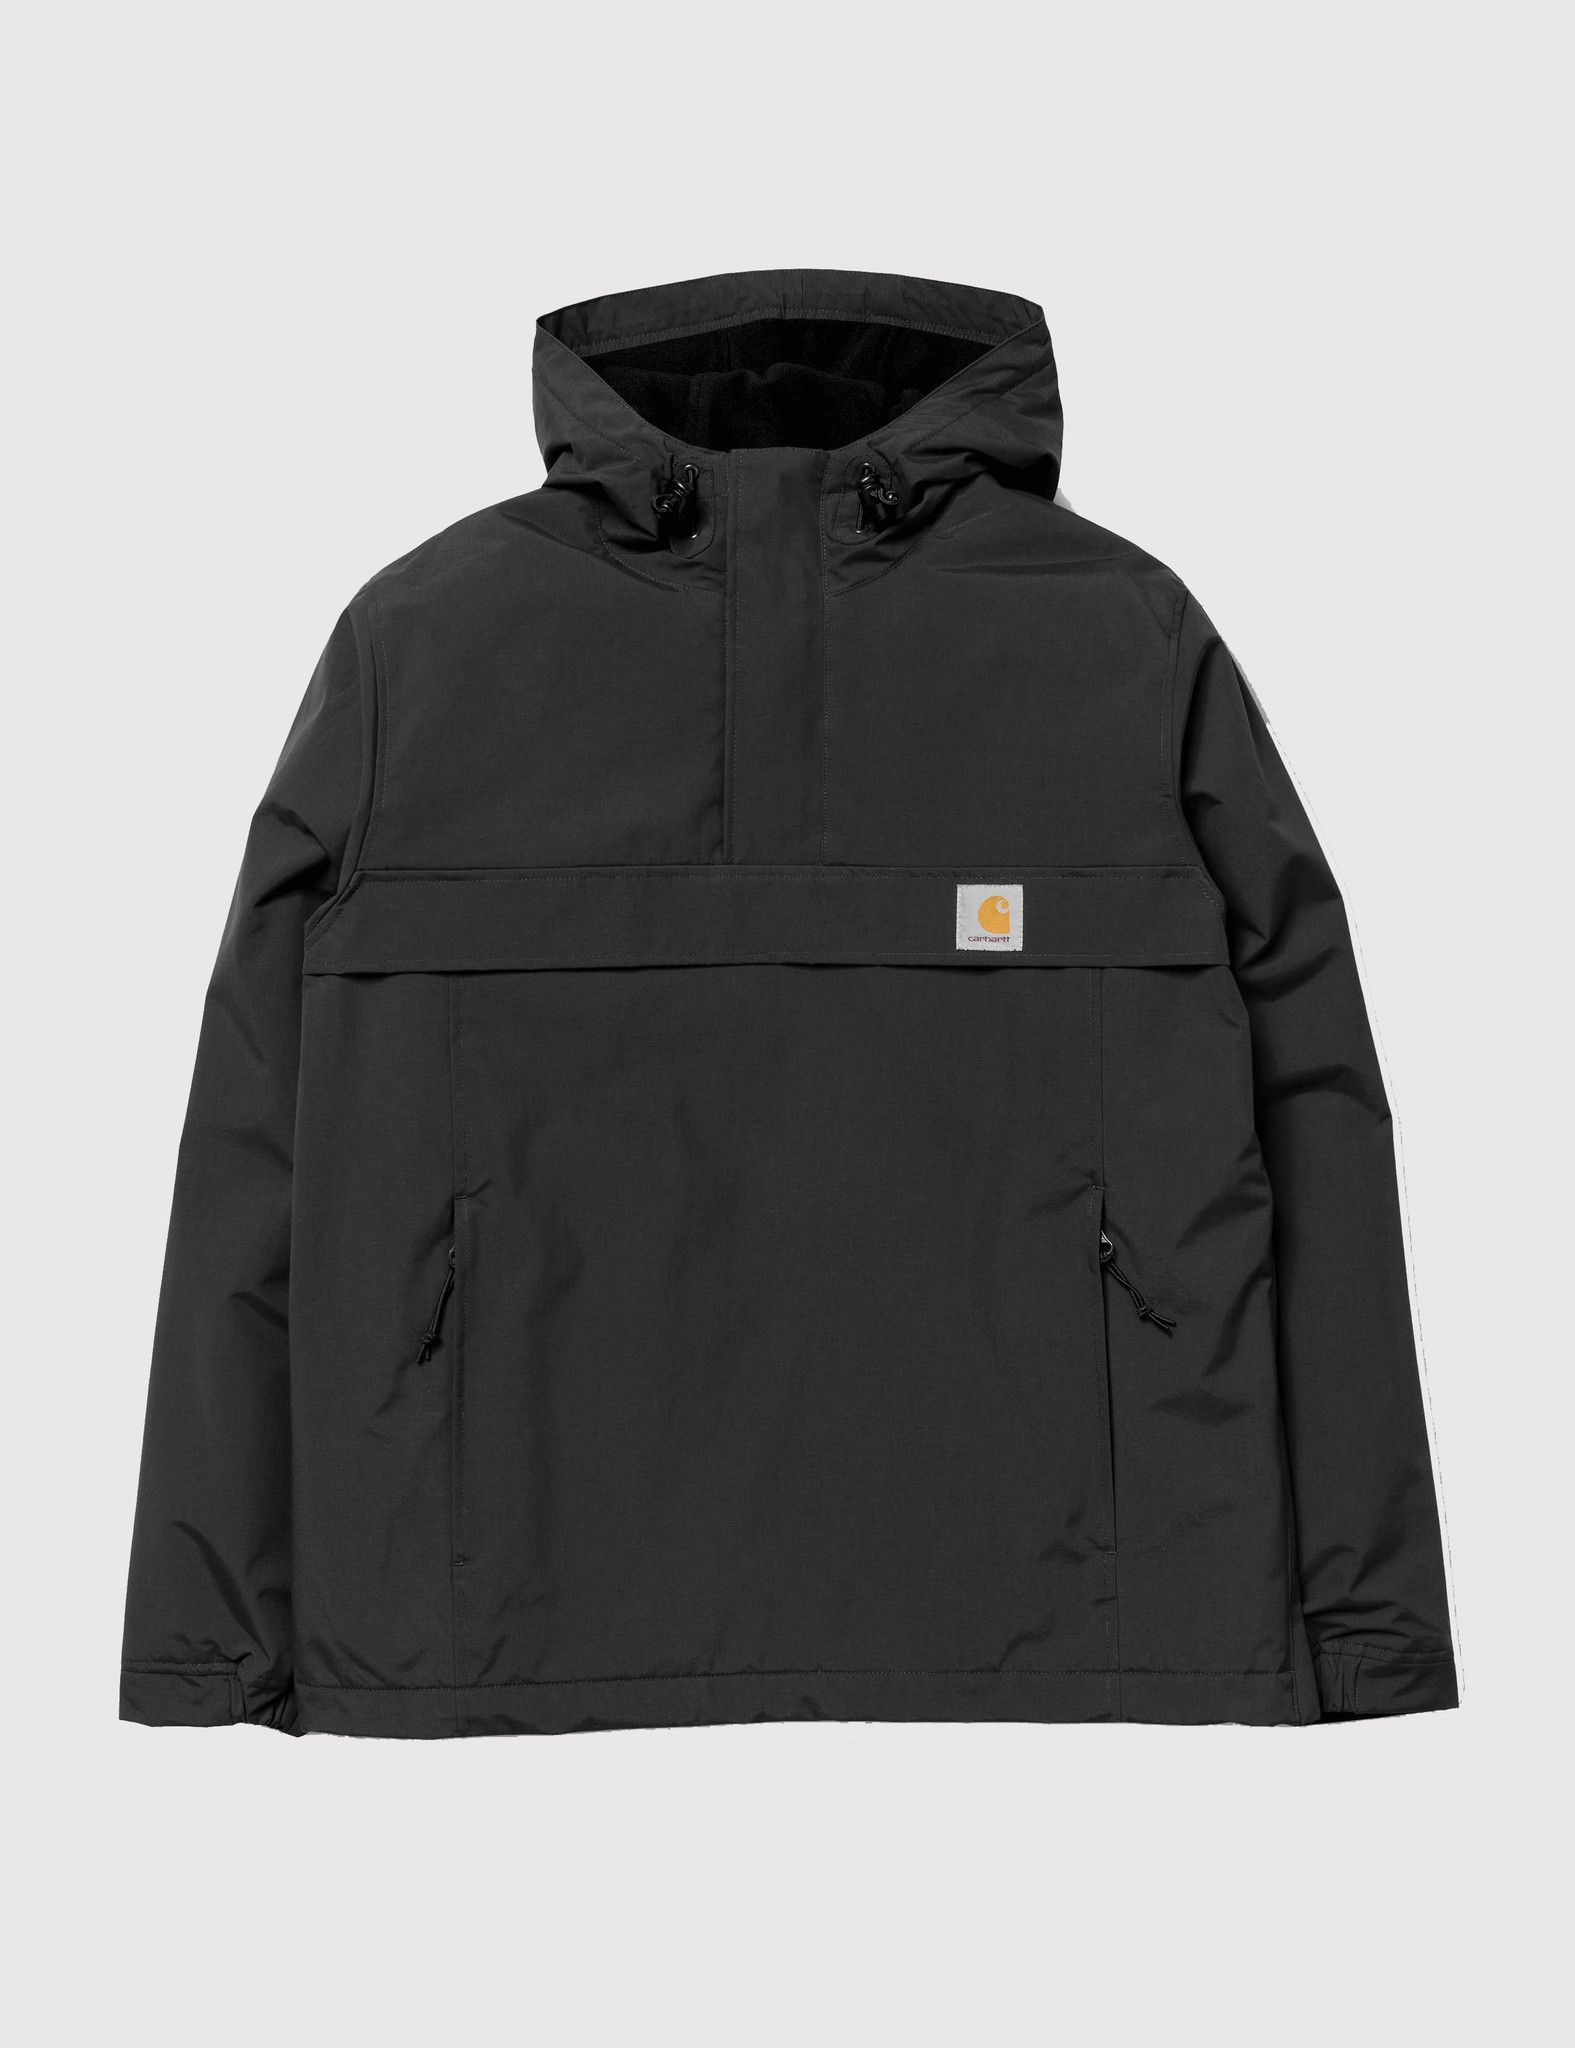 Para estrenar ff73c a5f86 Carhartt Nimbus Half-Zip Jacket (Fleece Lined) - Black ...